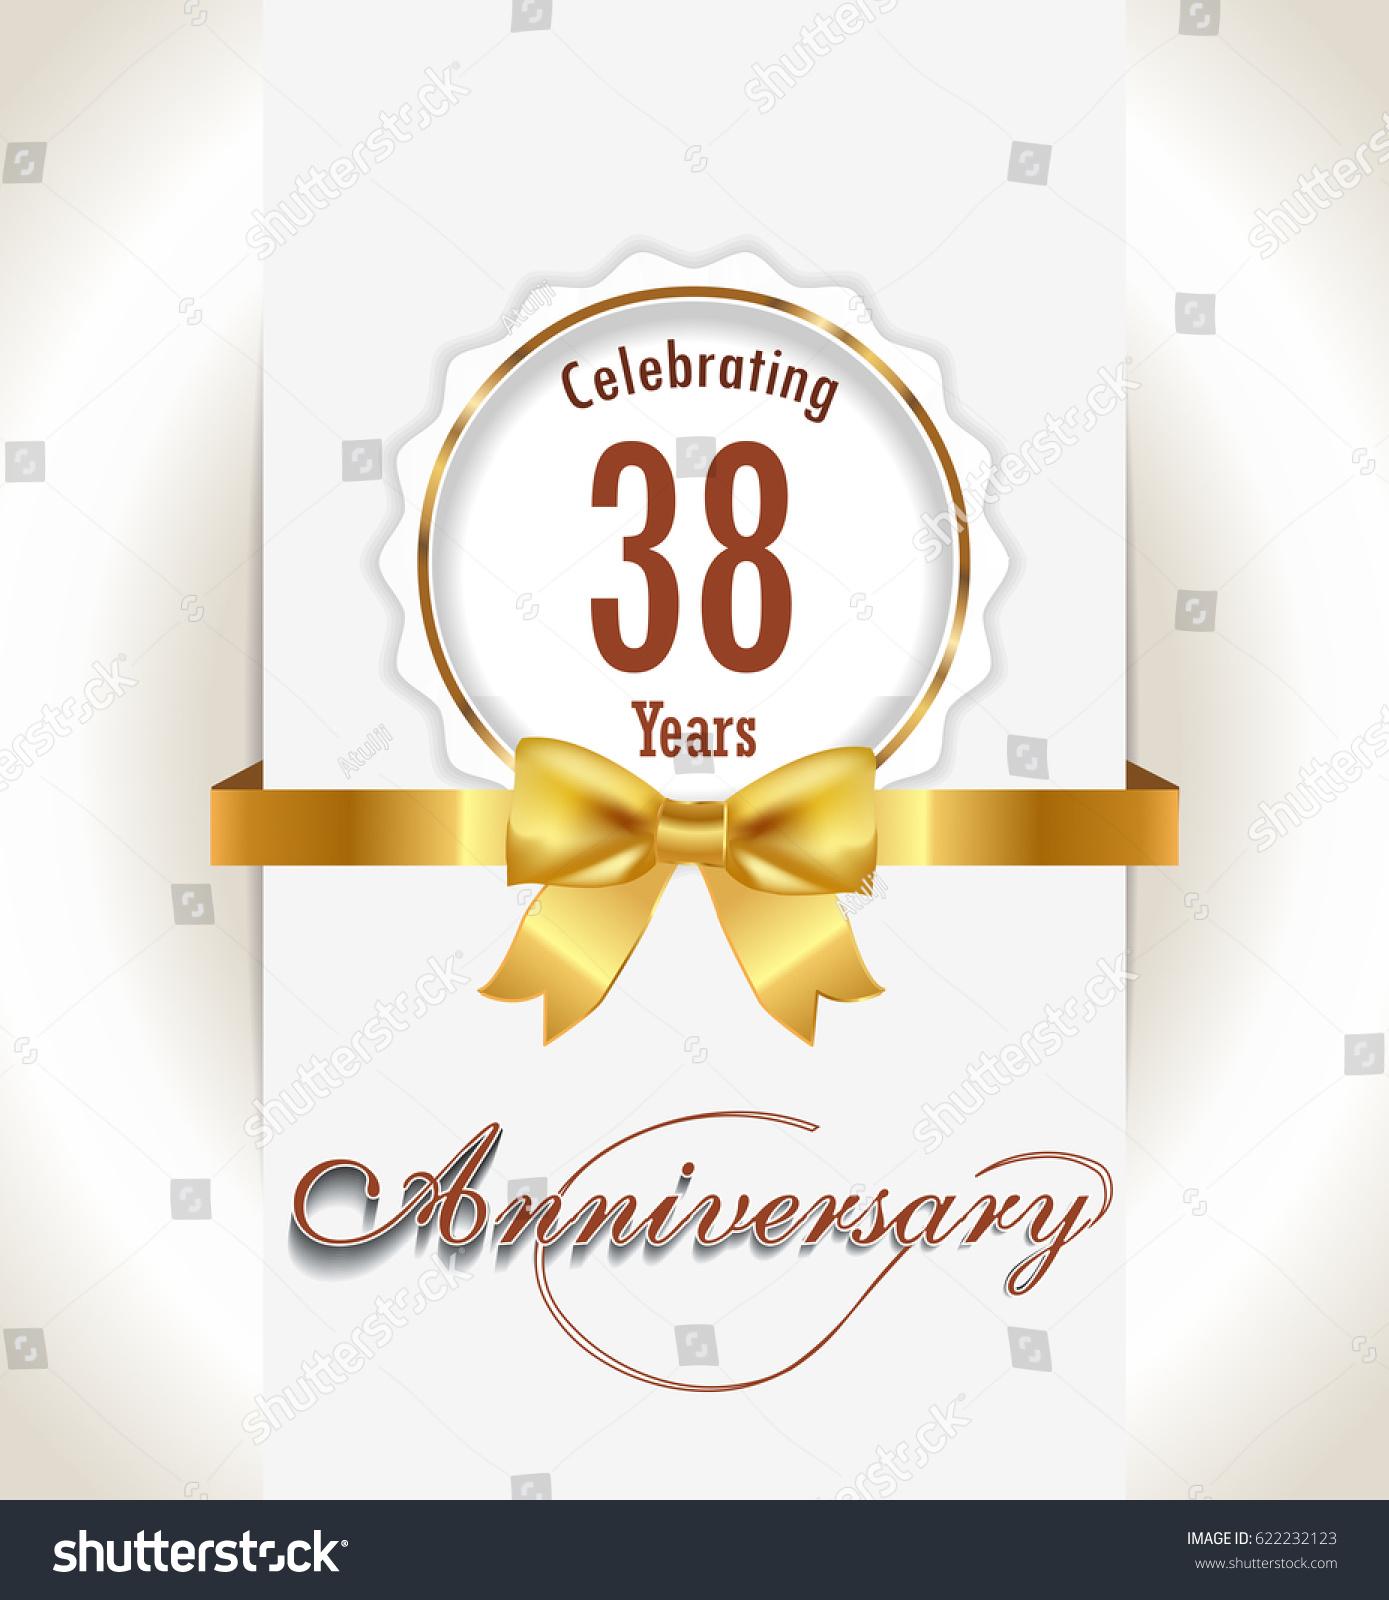 38th Anniversary Background 38 Years Celebration Stock